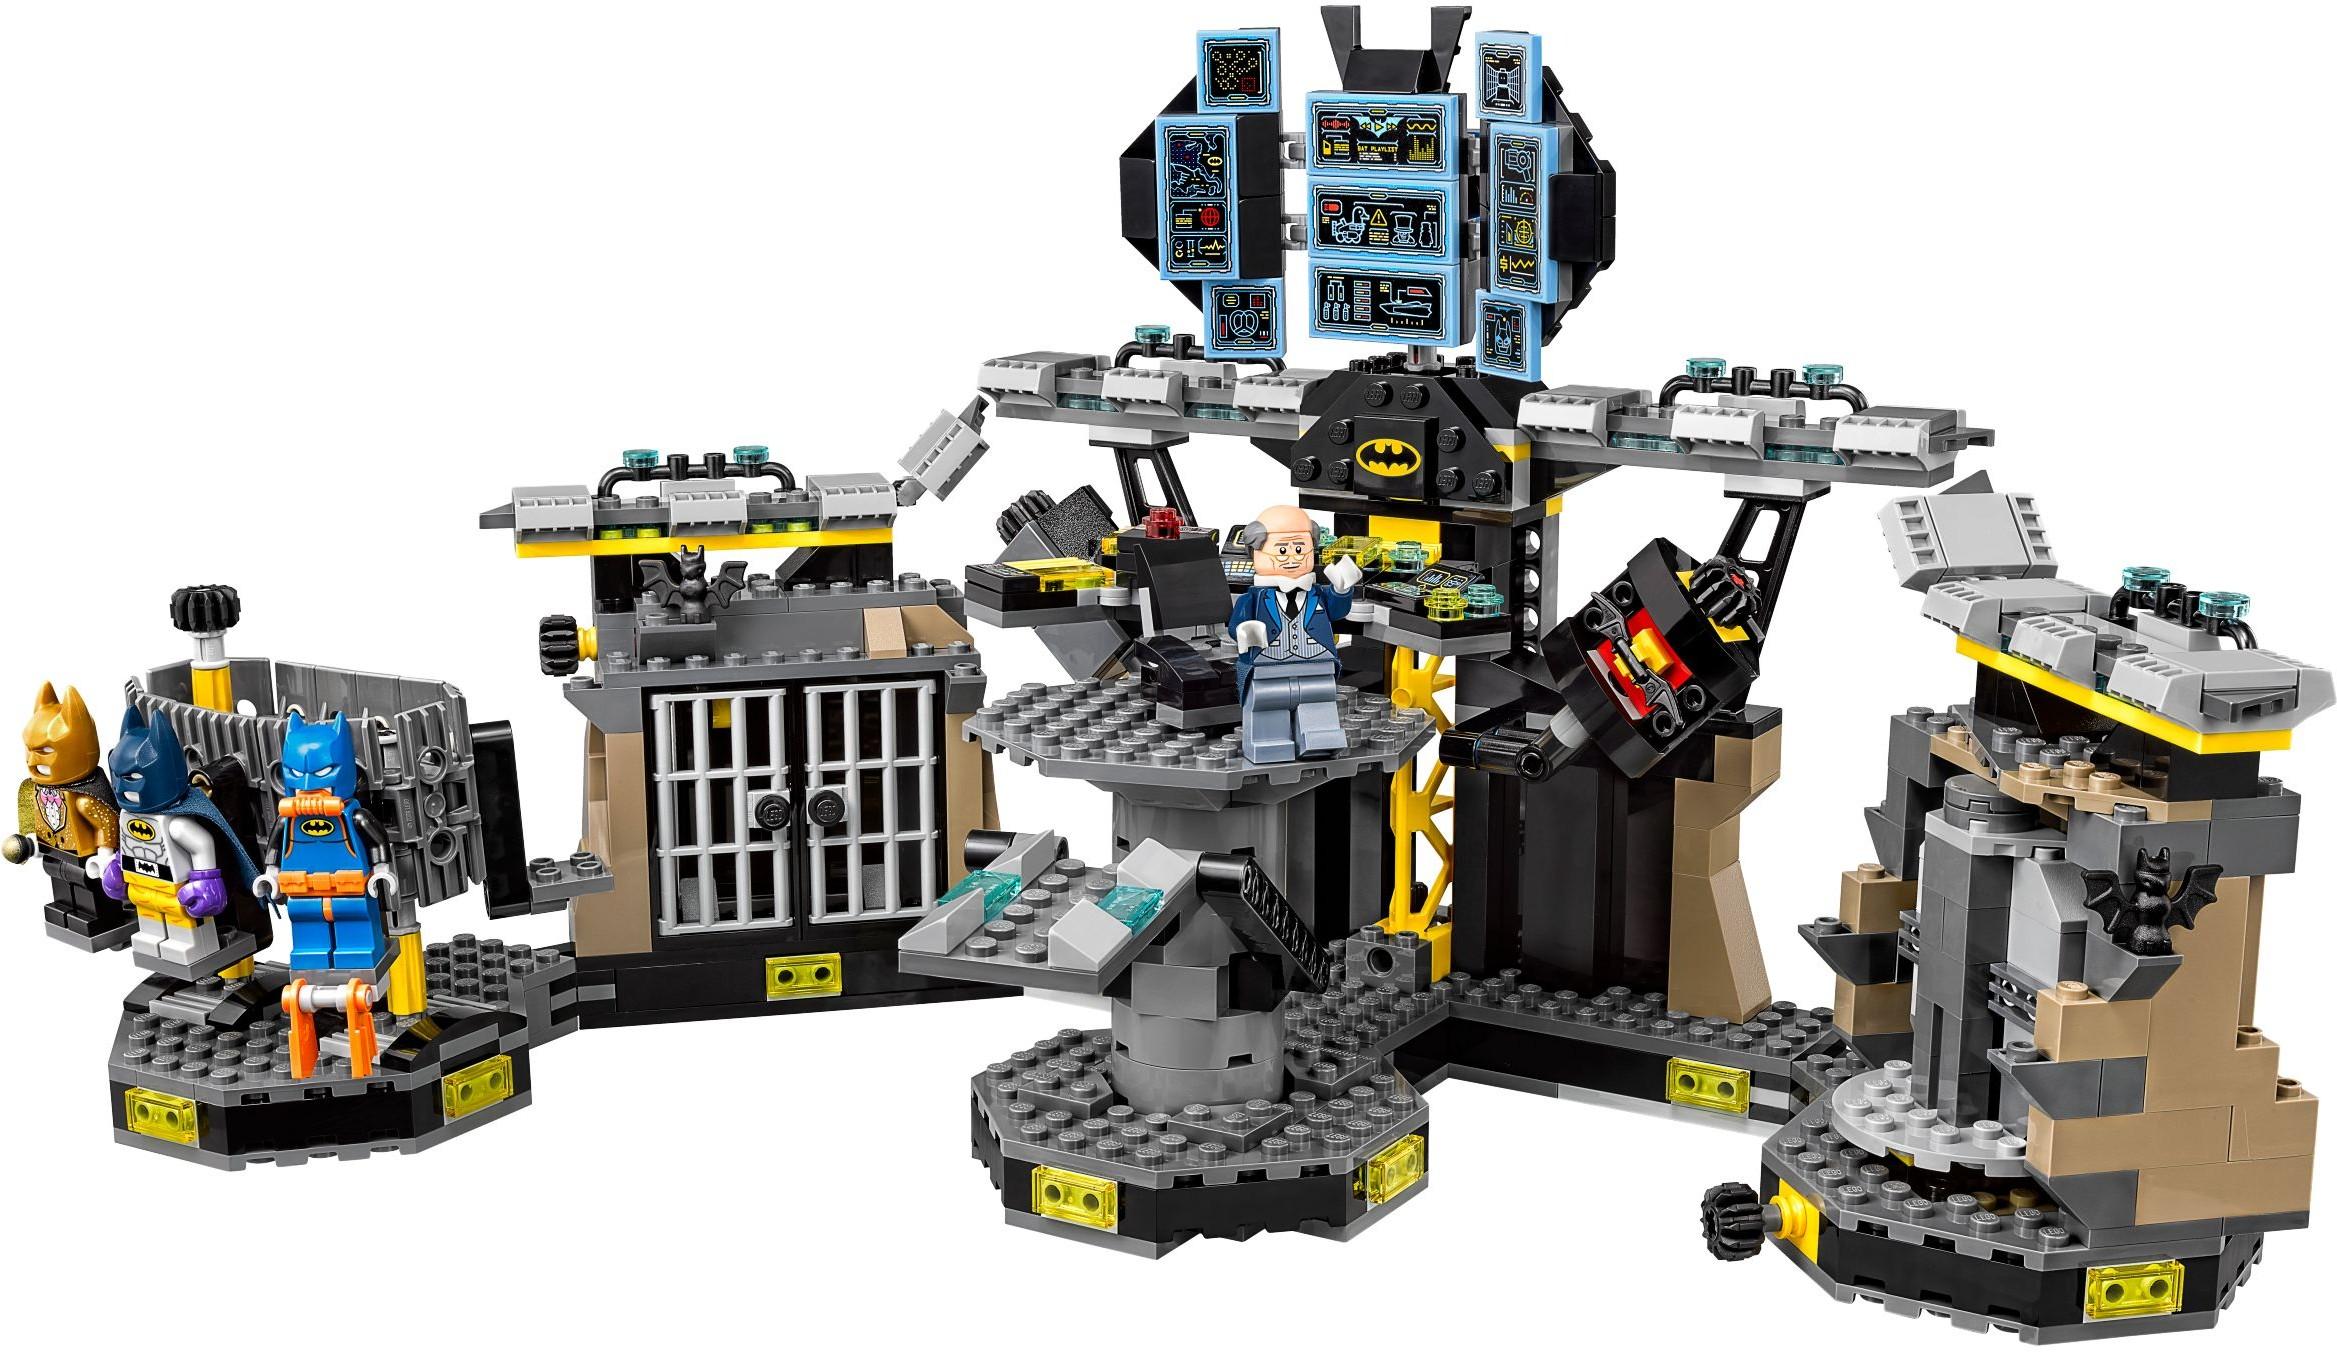 Mua đồ chơi LEGO 70909 - LEGO Batman Movie 70909 - Hang Động Batcave của Người Dơi (LEGO Batman Movie Batcave Break-in 70909)